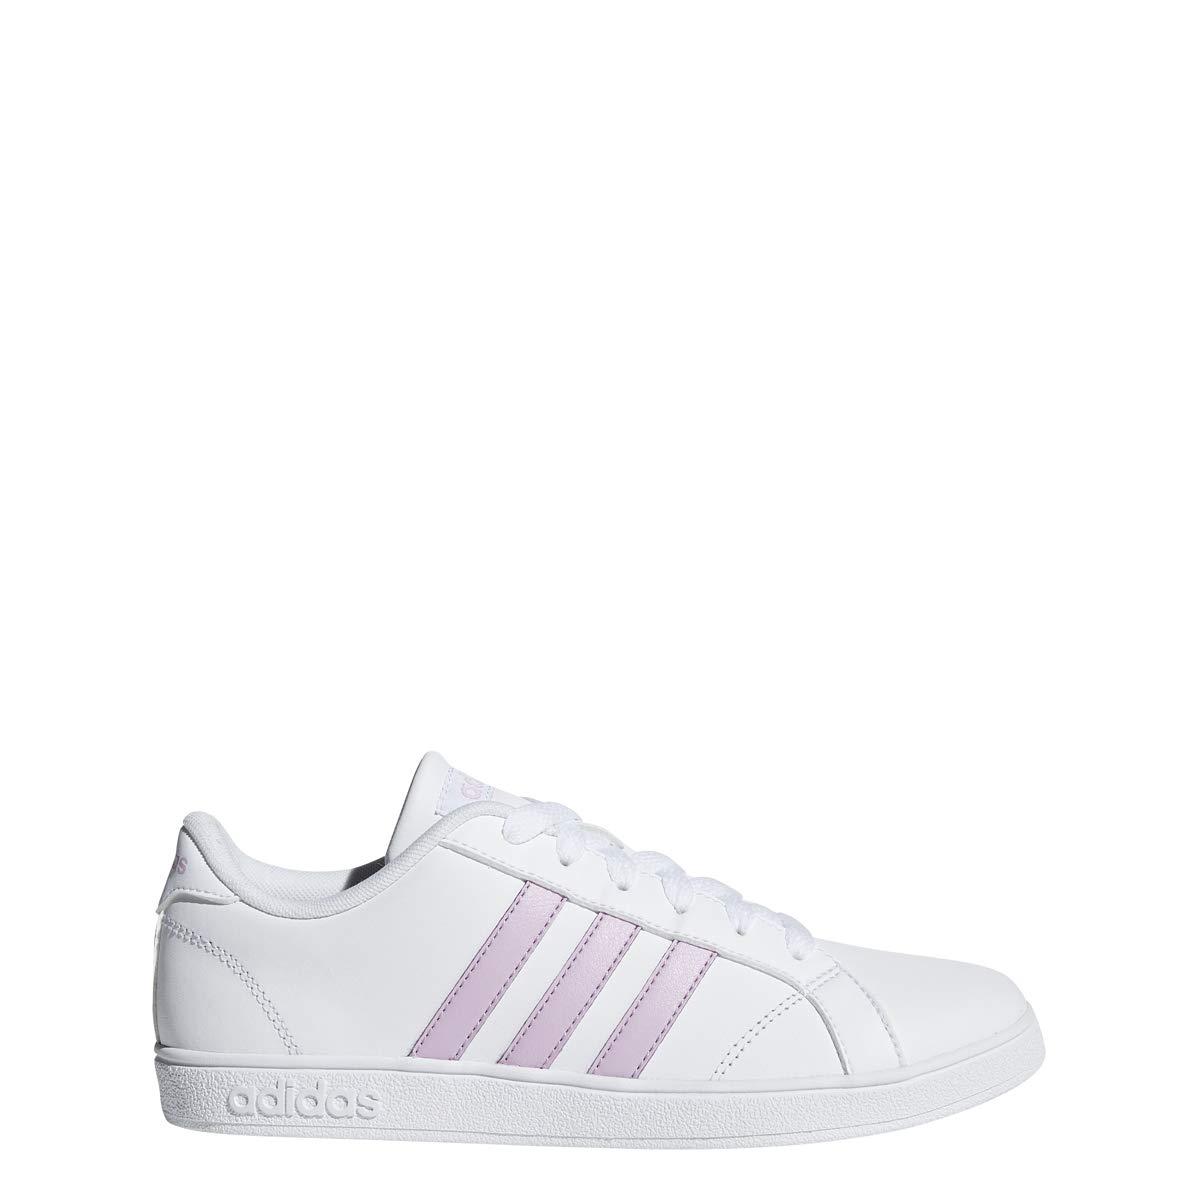 best service 5fcd7 8096d Galleon - Adidas Performance Unisex-Kids Baseline, White Clear Lilac White,  1 M US Little Kid